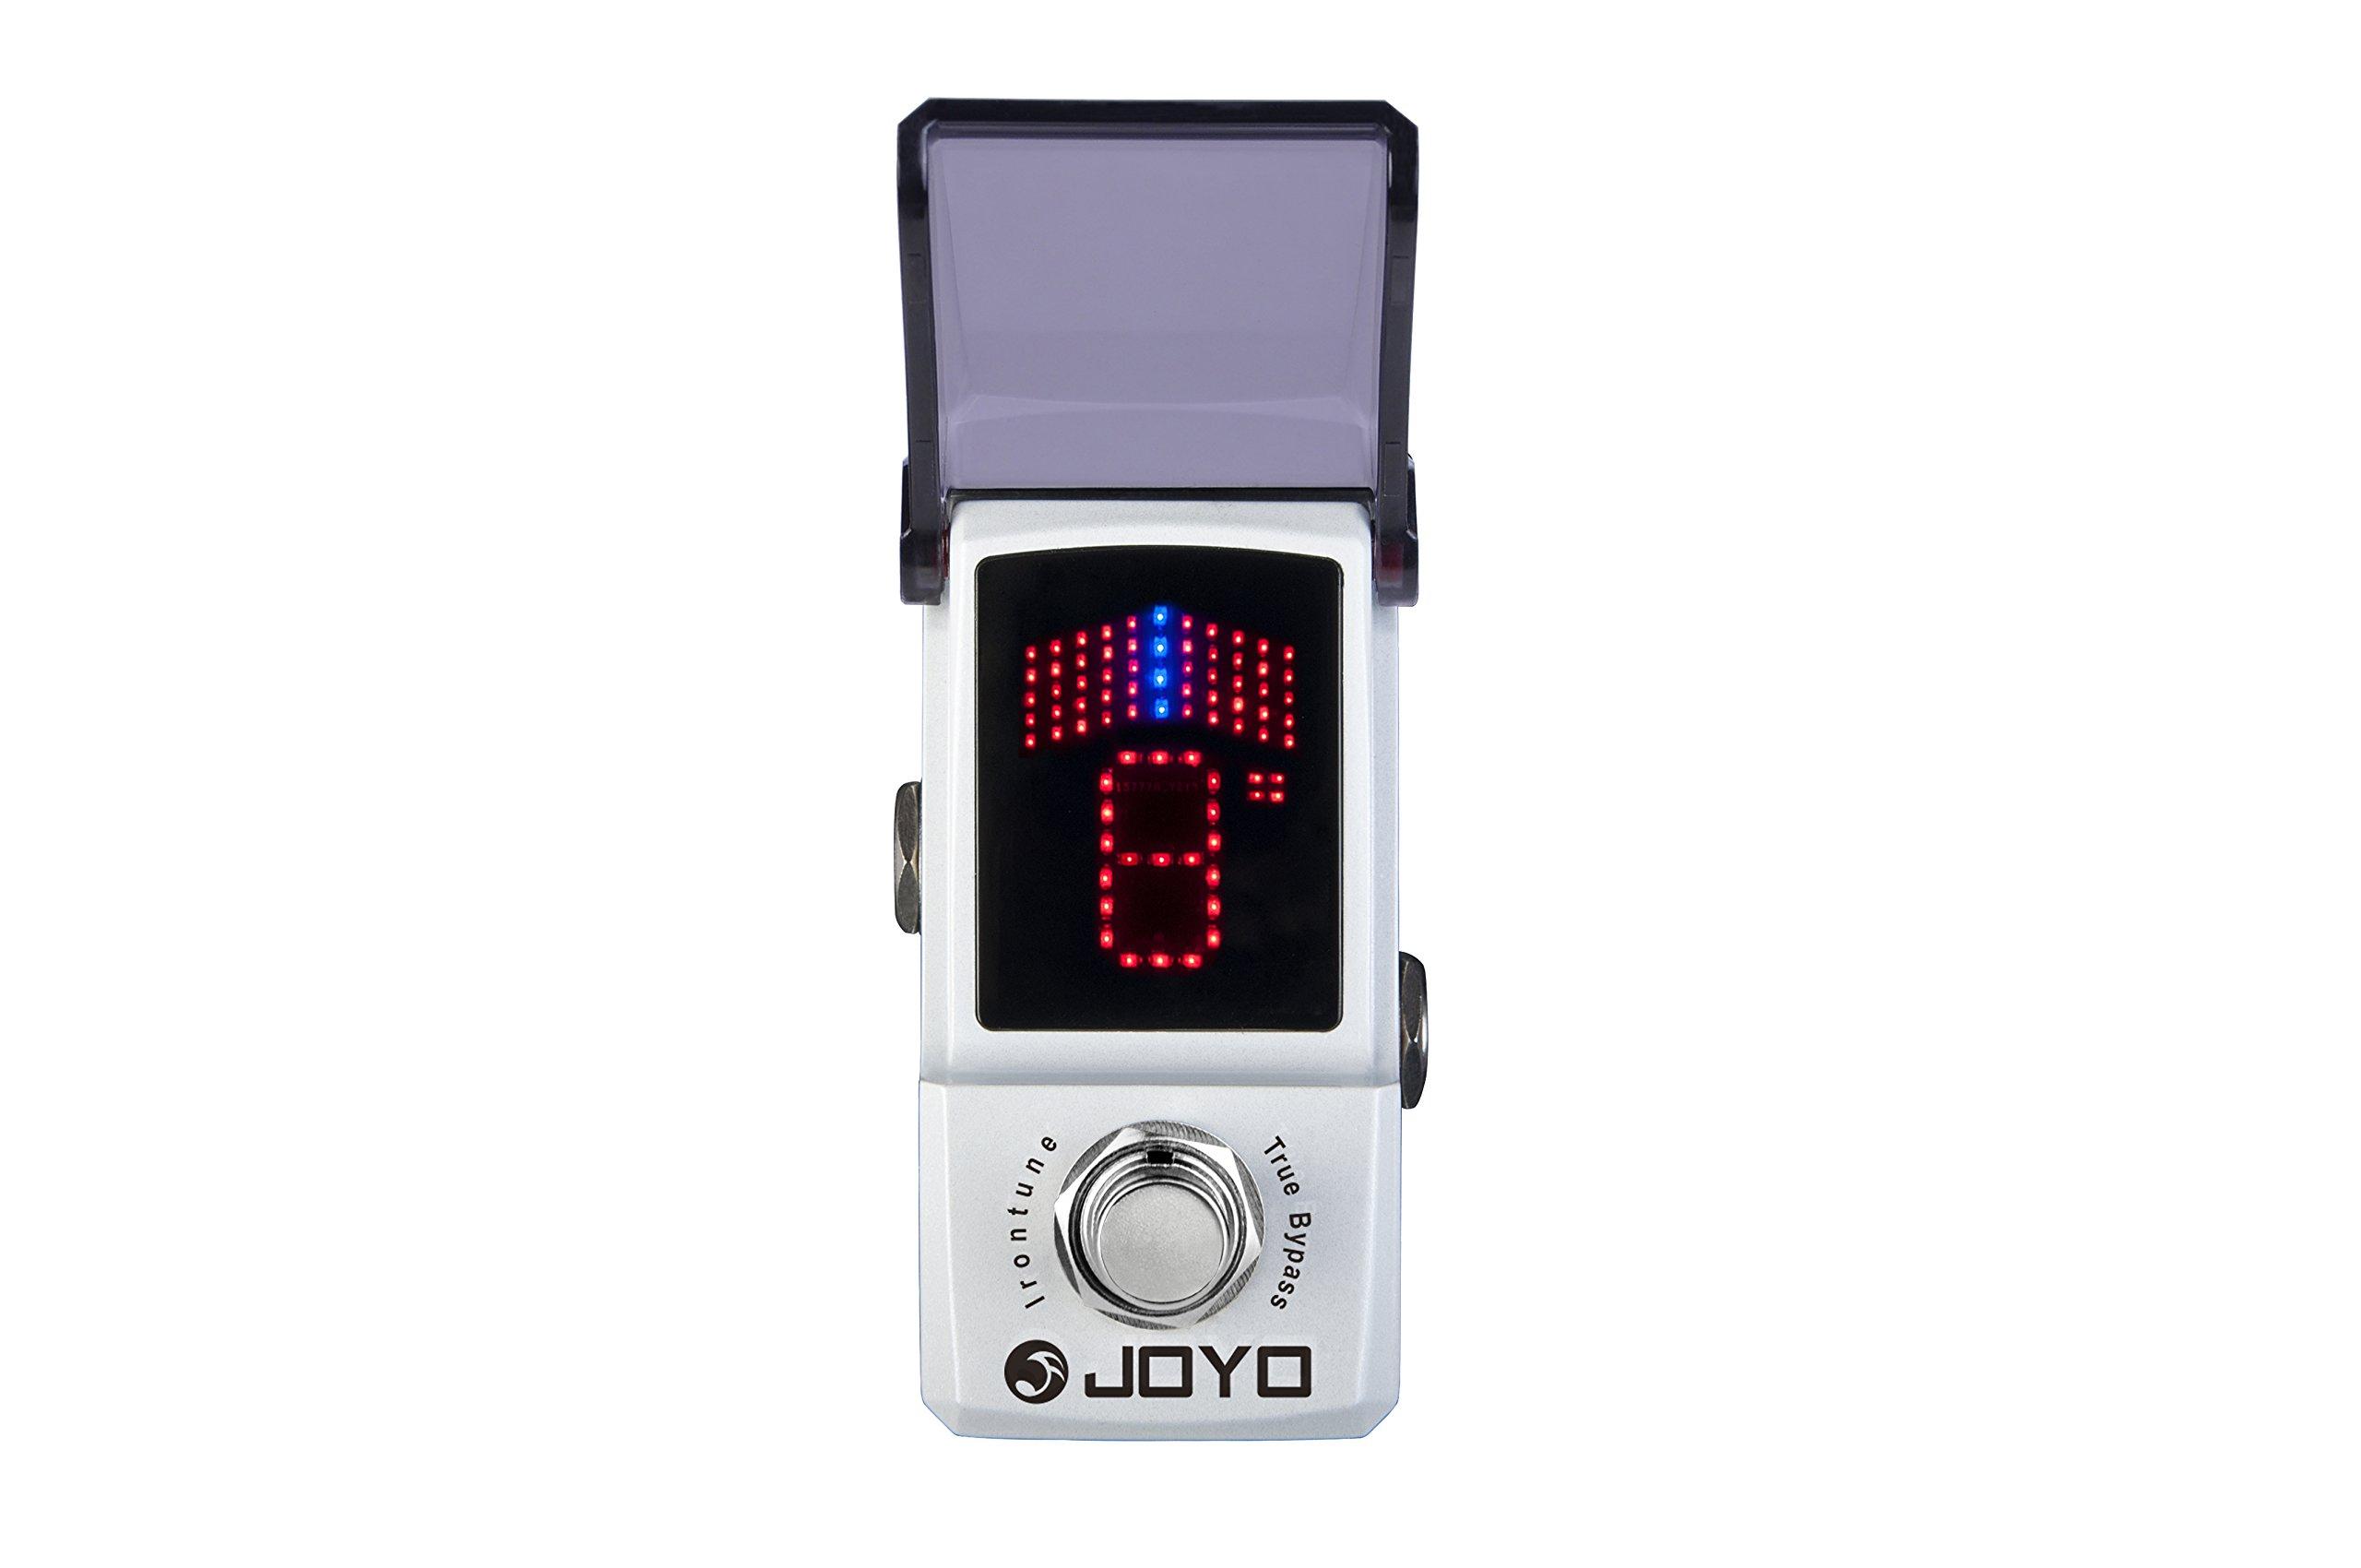 Joyo JF-326 Irontune Pedal Tuner Electric Guitar Single Effect